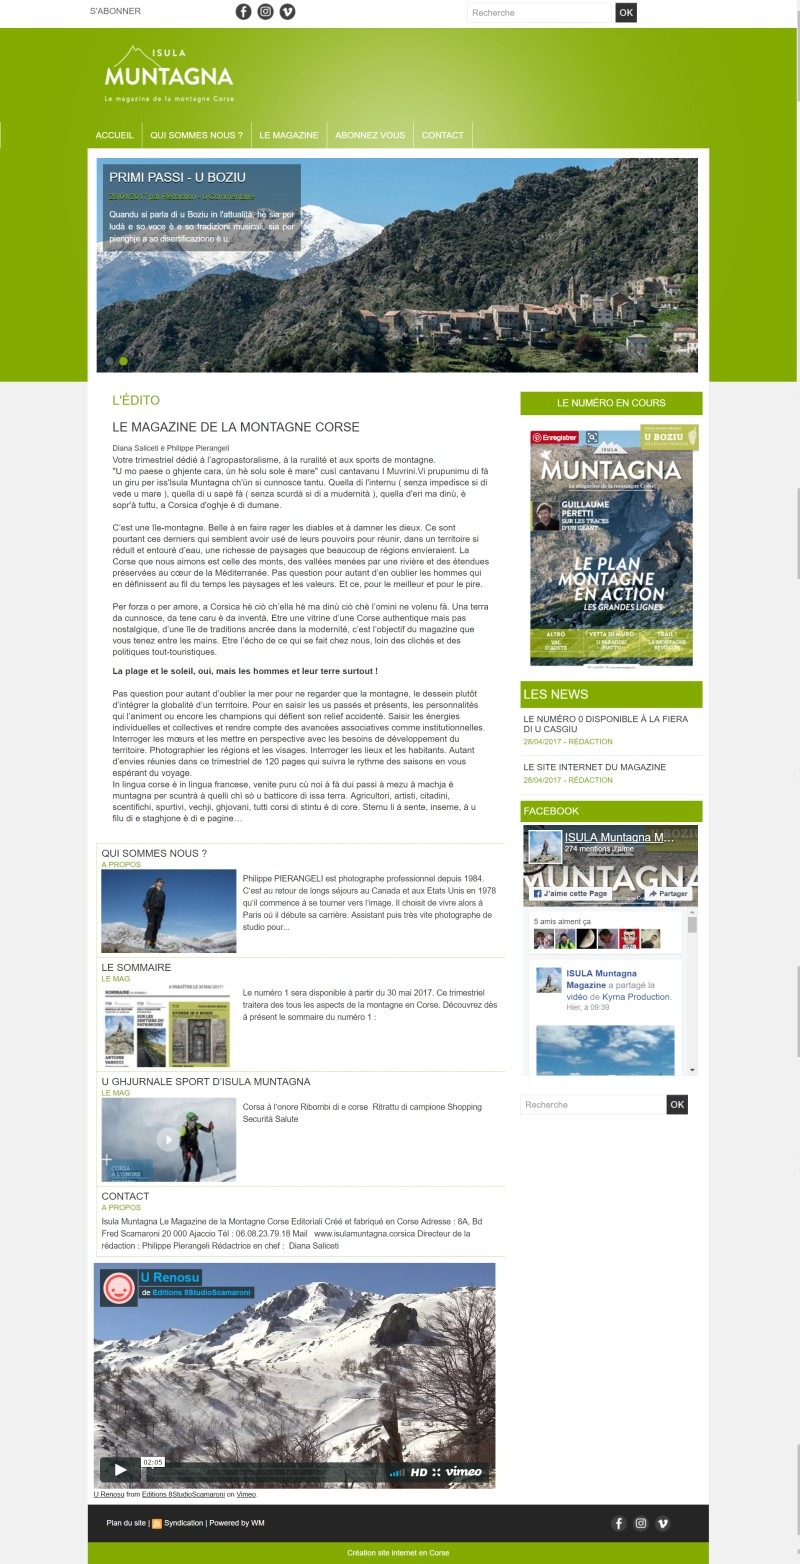 Nouveau site internet : Isula Muntagna